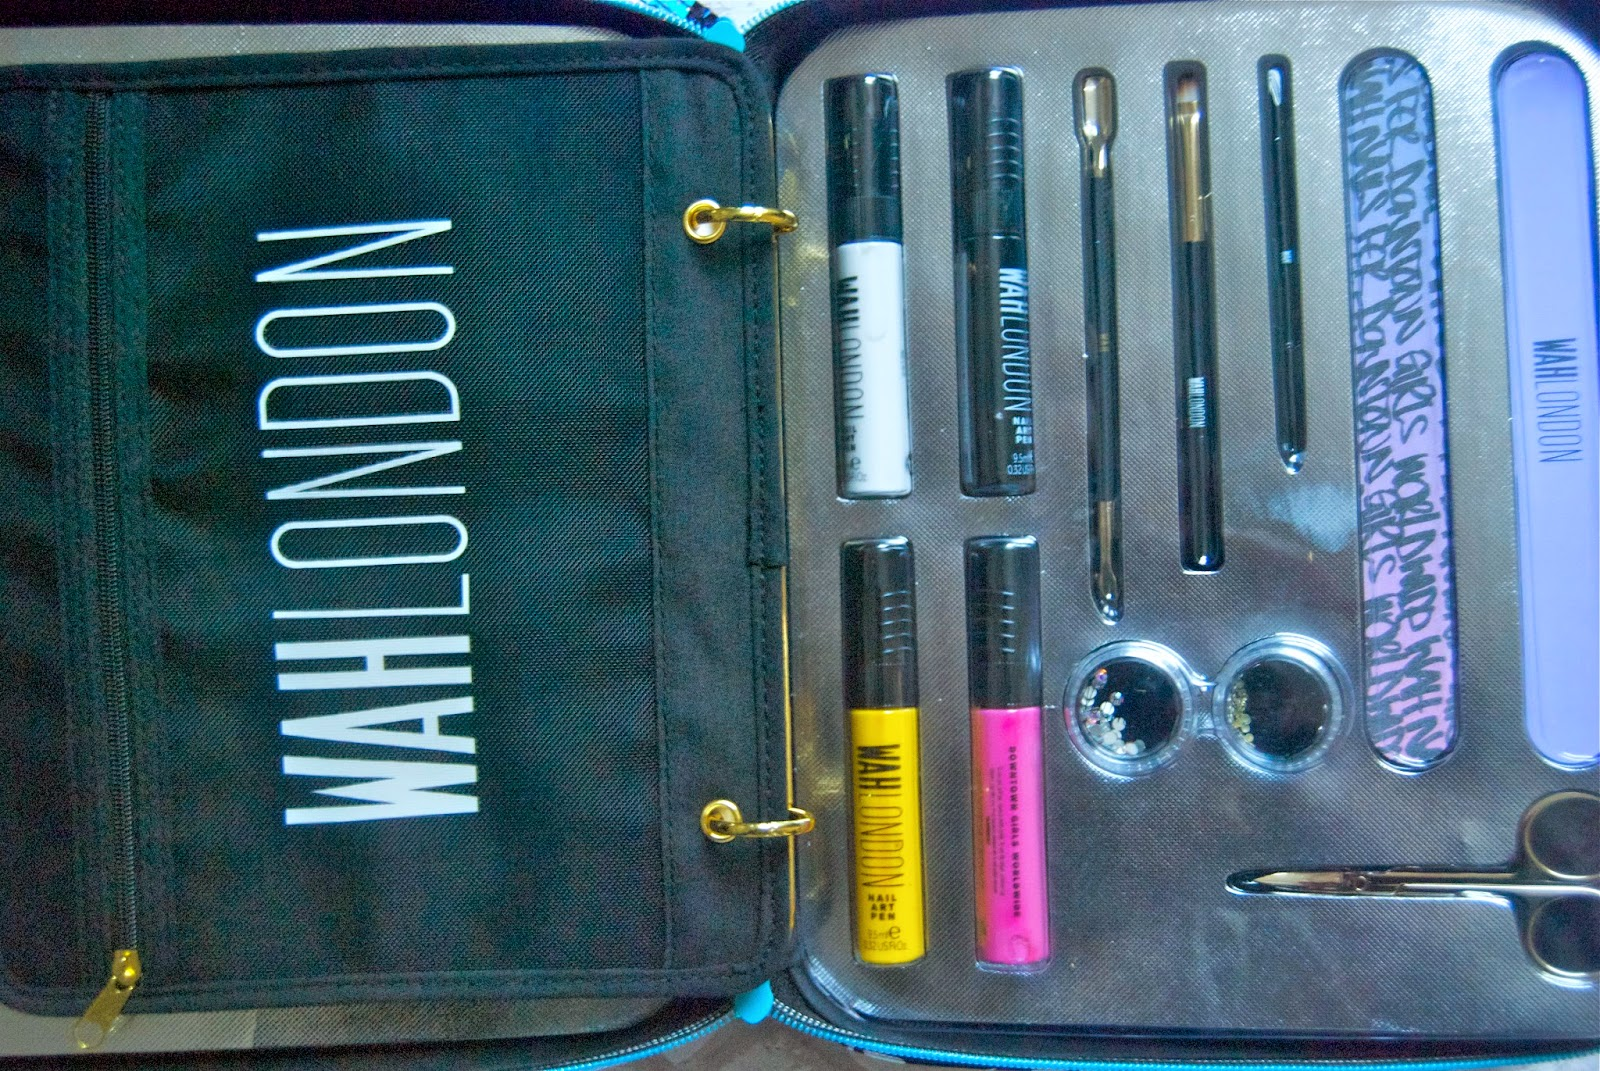 Review: WAH London The Ultimate Nail Art Kit